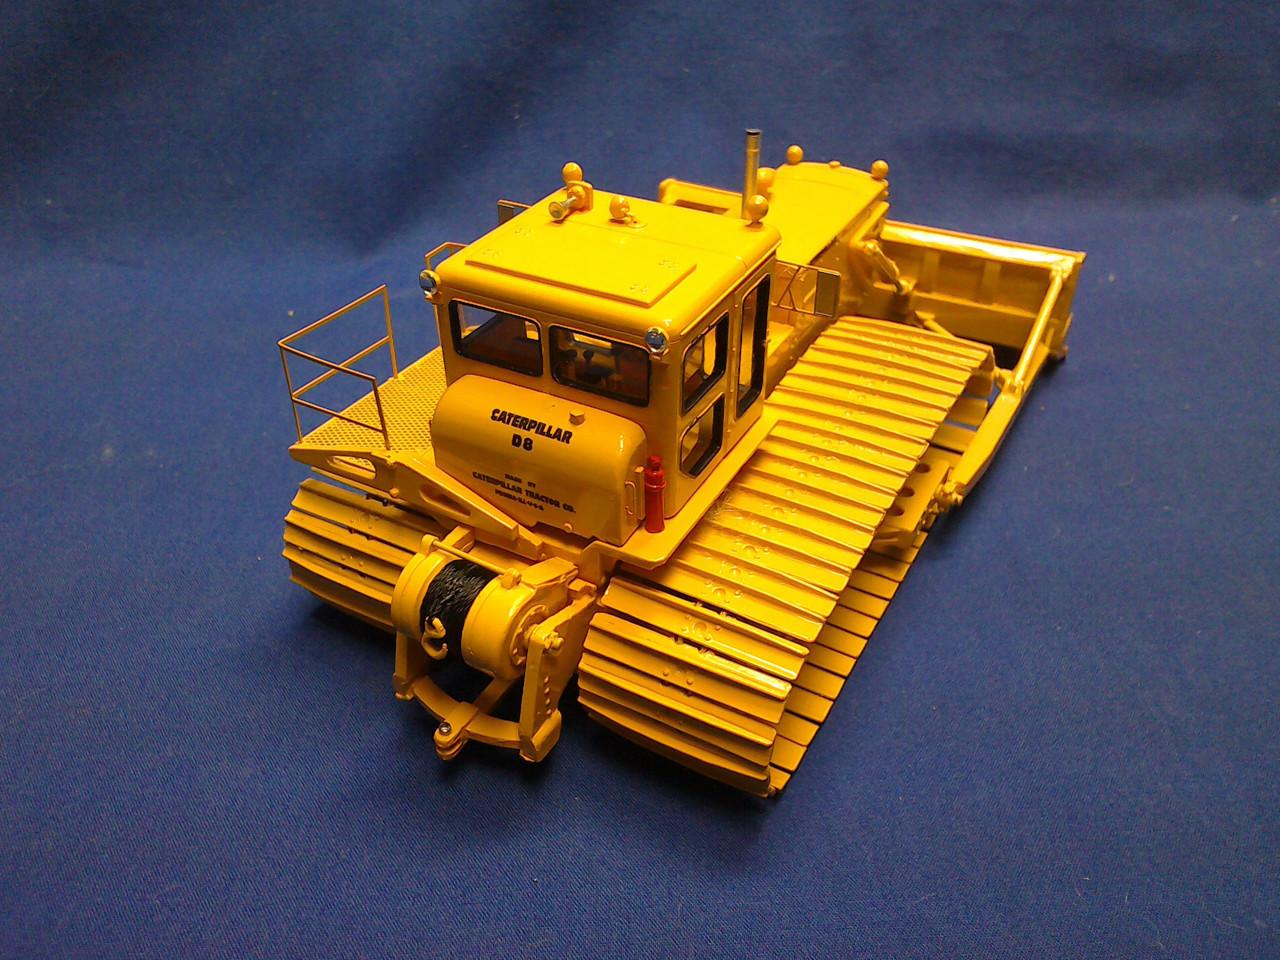 Picture of Cat S-D8LGP snow dozer  Series 2